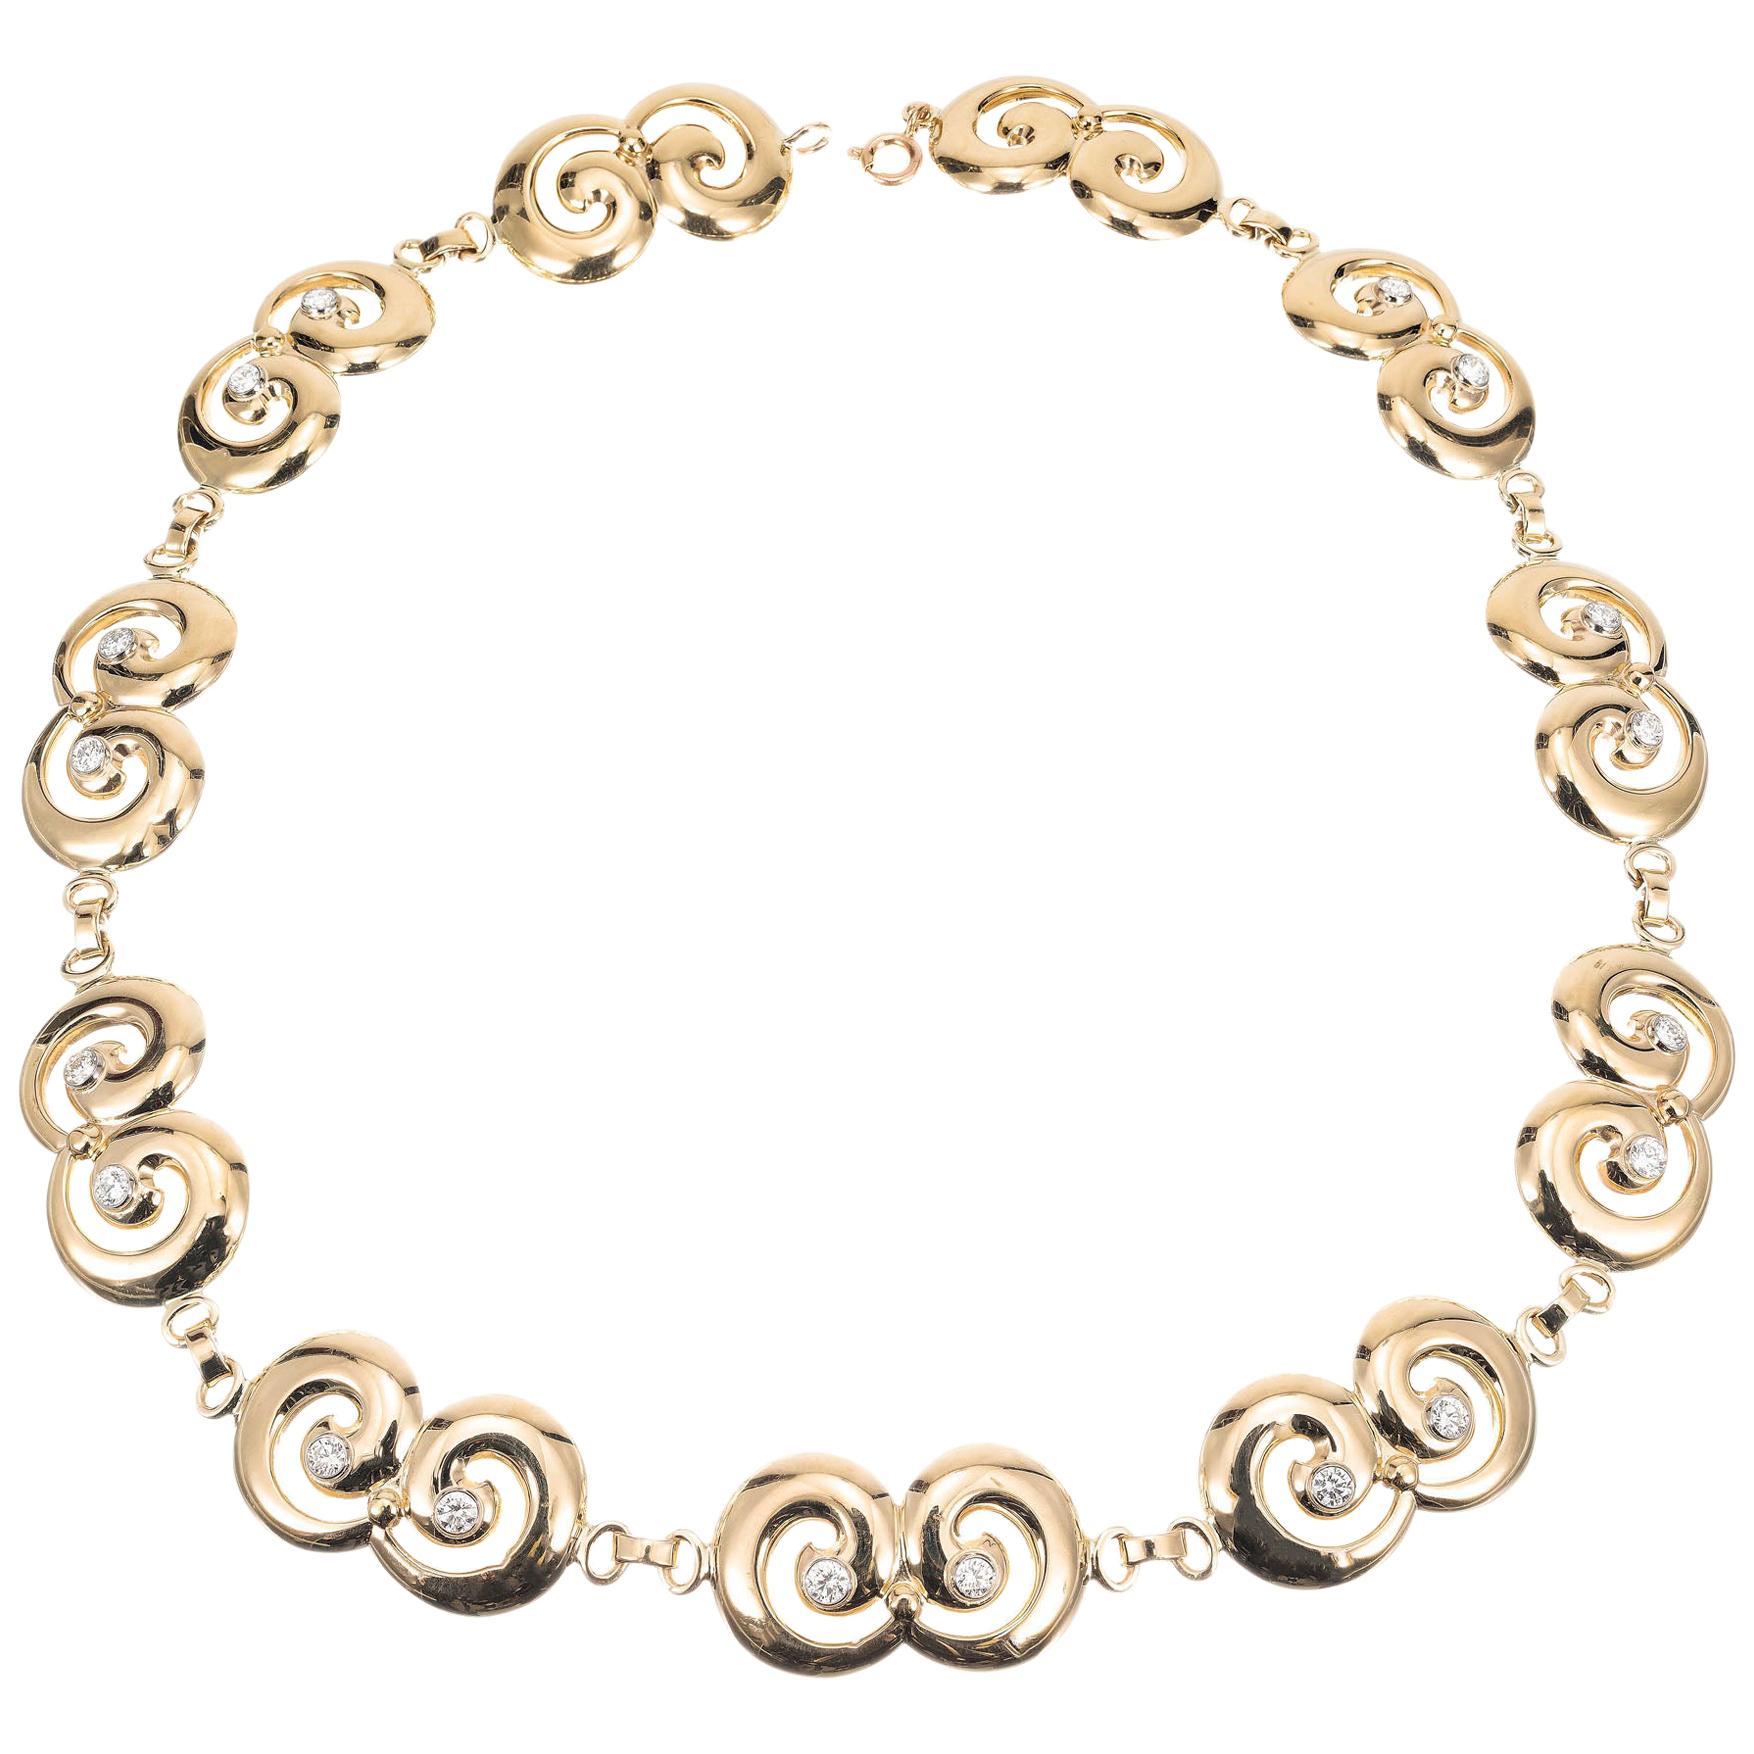 Tiffany & Co 1.80 Carat Diamond Yellow Gold Swirl Link Necklace